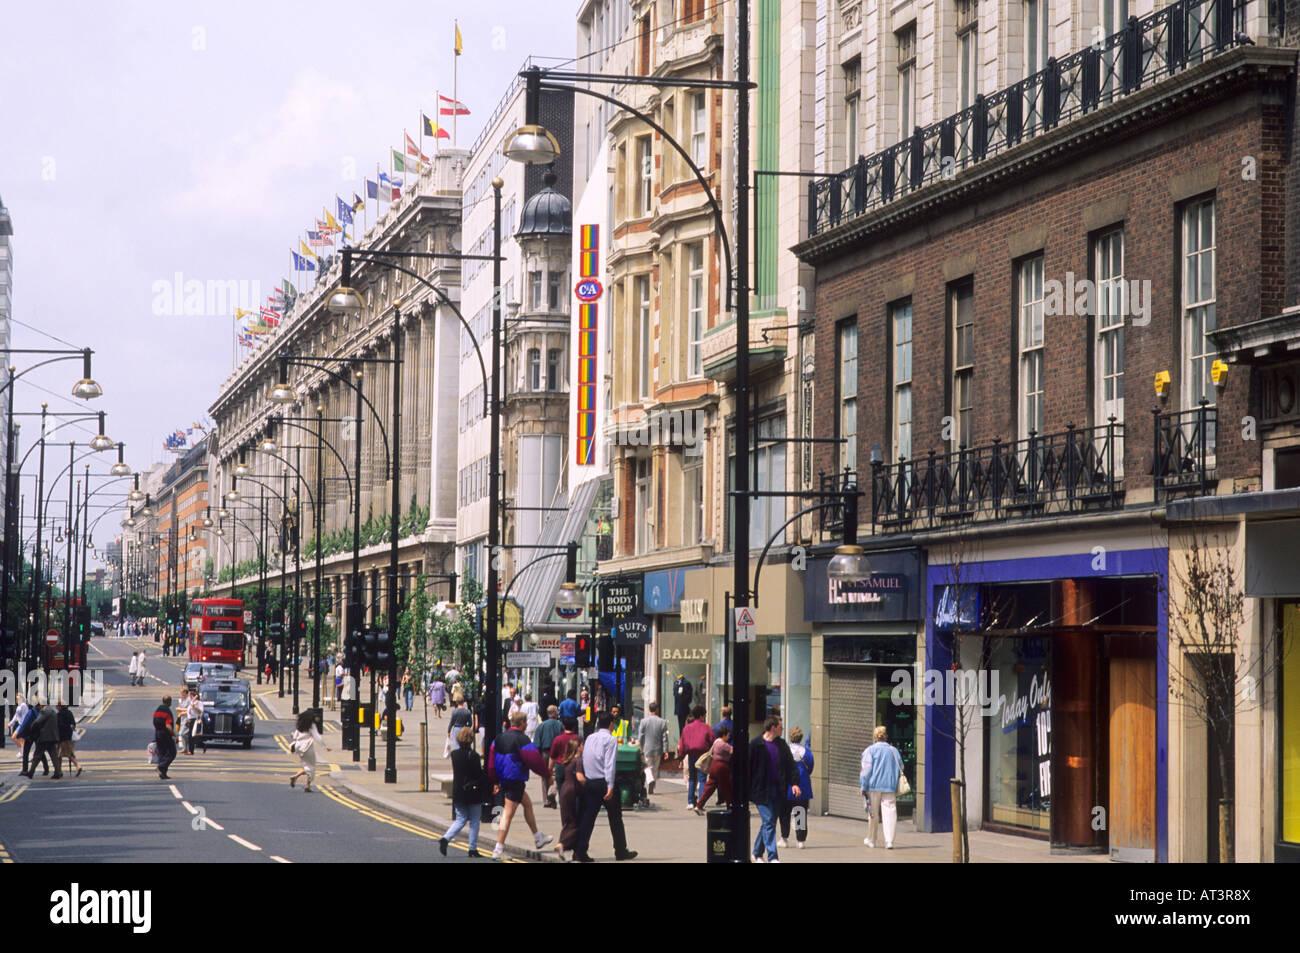 Oxford Street Selfridges London west end red bus England UK - Stock Image